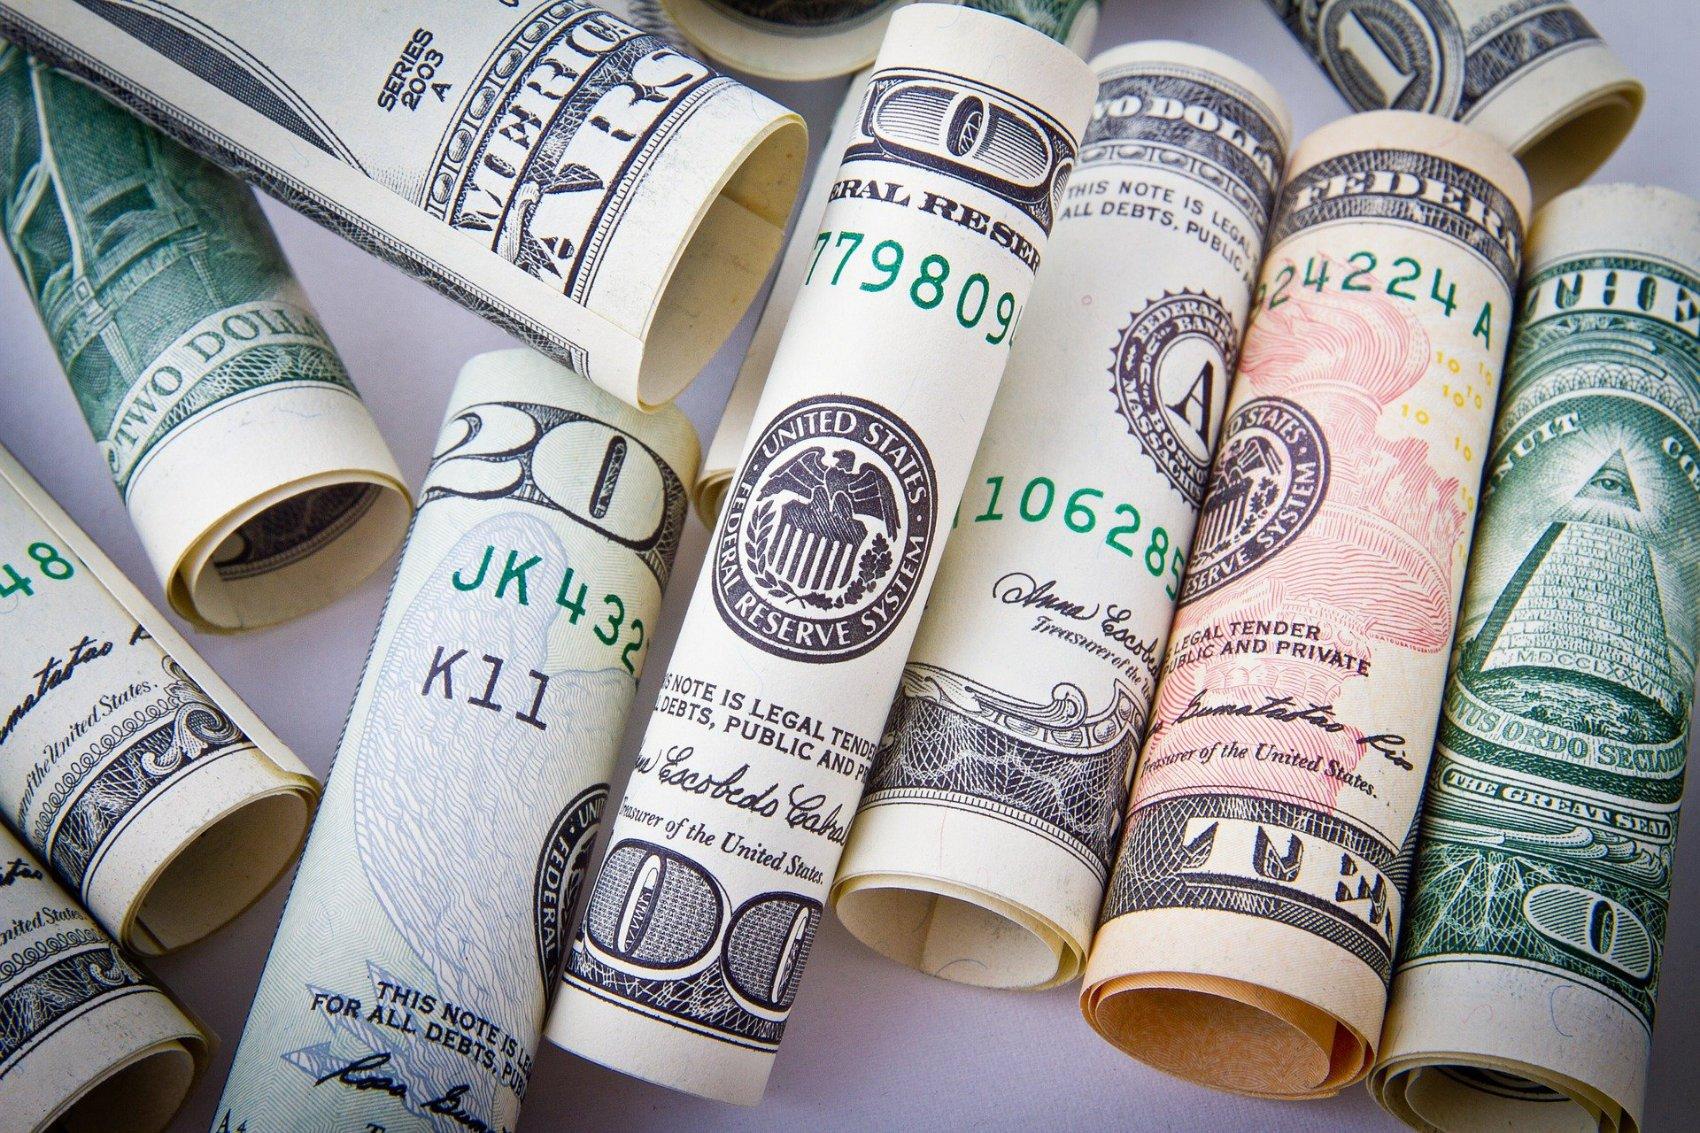 US Money - Image by Nikolay Frolochkin